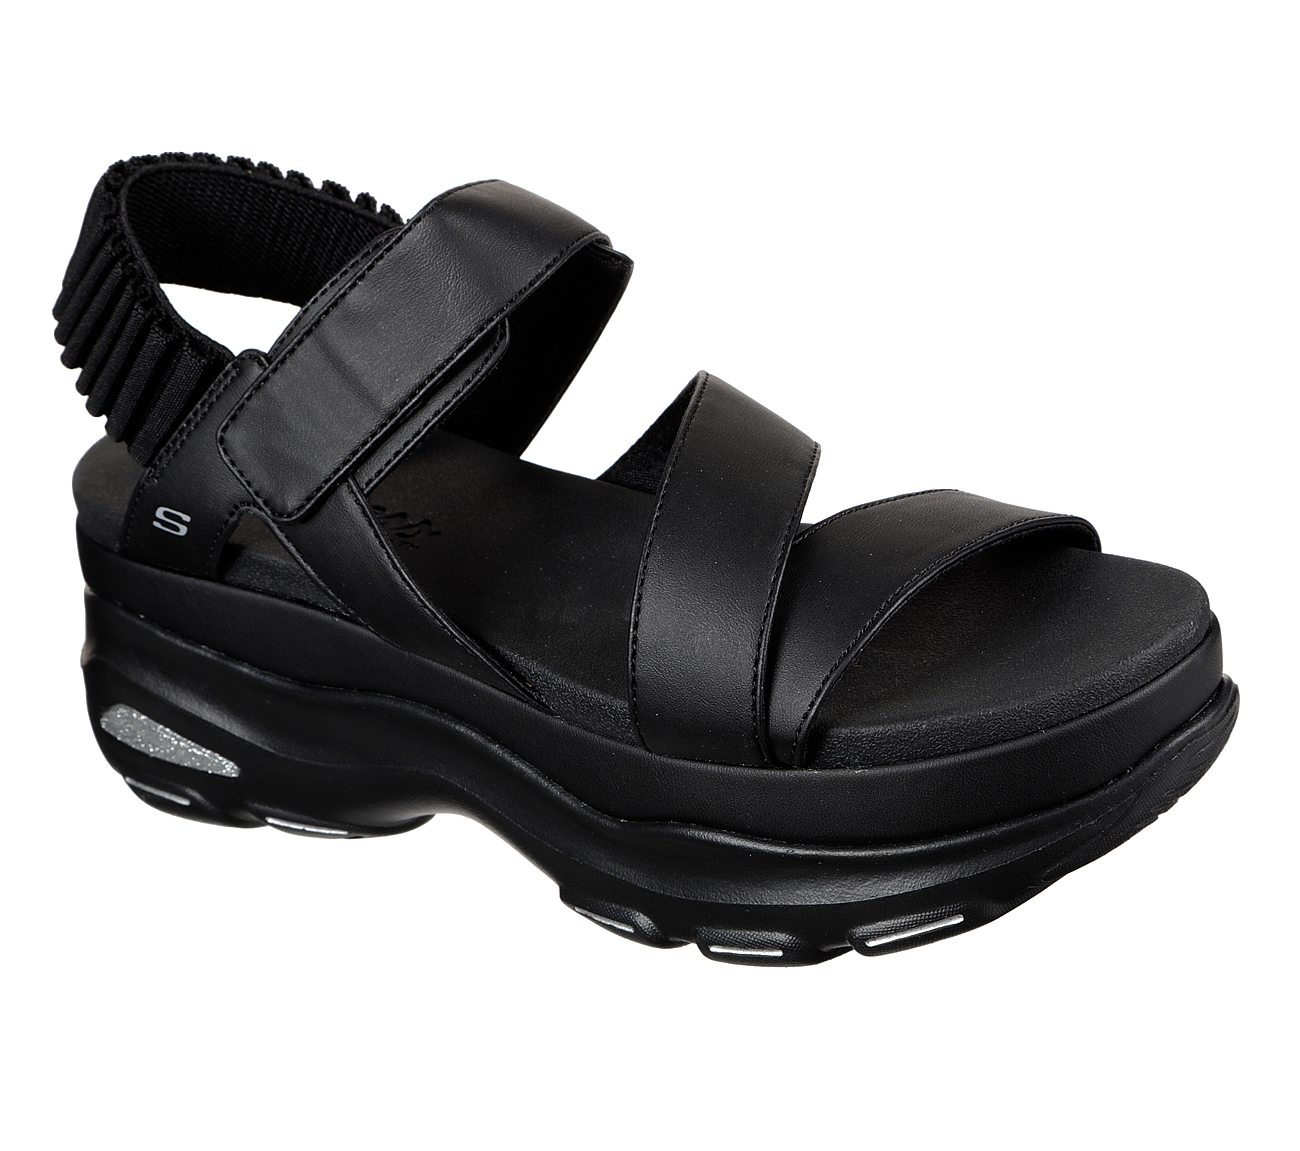 Buy SKECHERS Cloud Ultra Cali Shoes